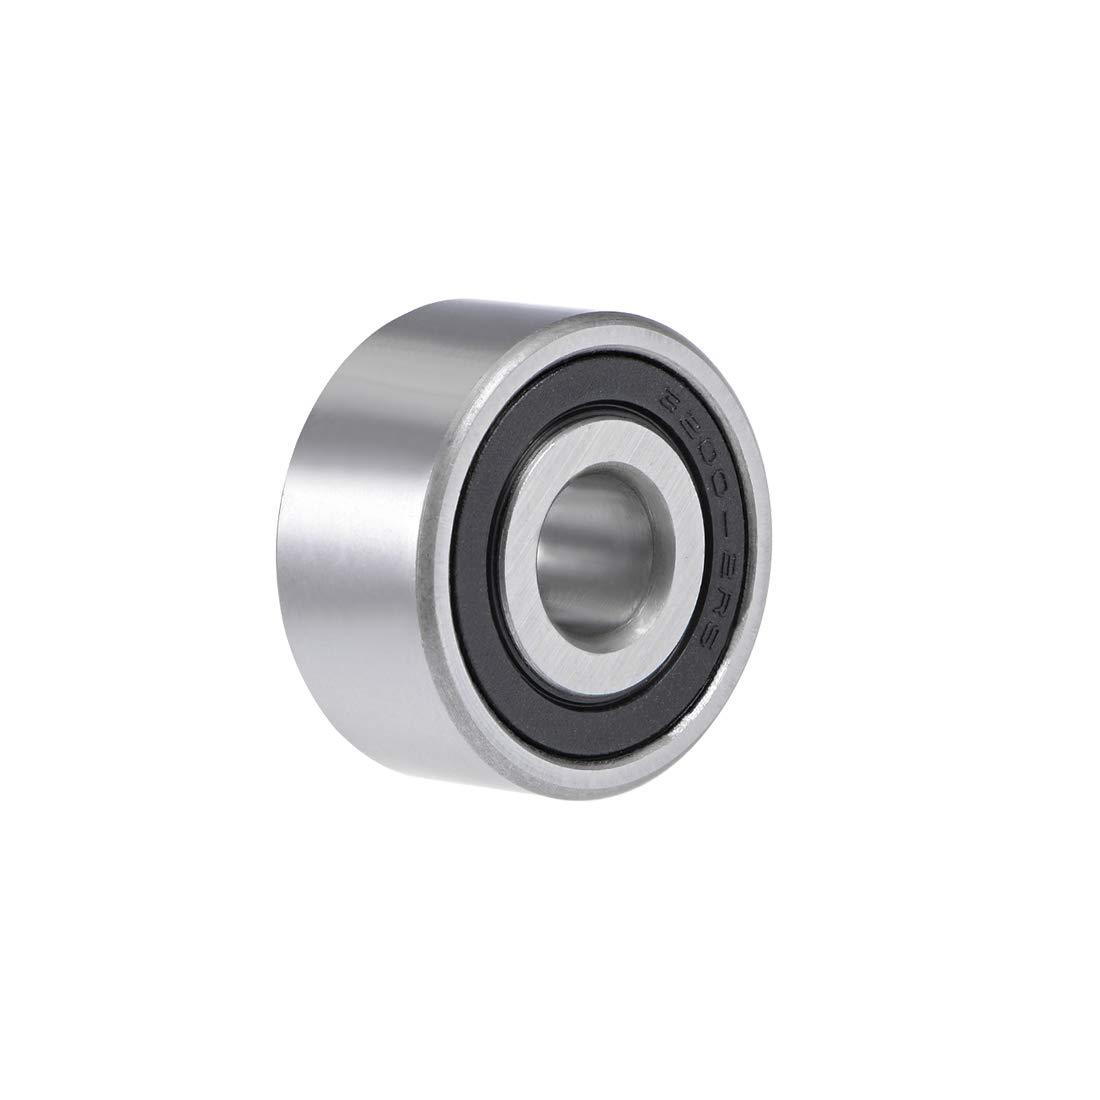 uxcell 3200-2RS Angular Contact Ball Bearing 10X30X14.3mm Sealed Bearings 5200-2RS